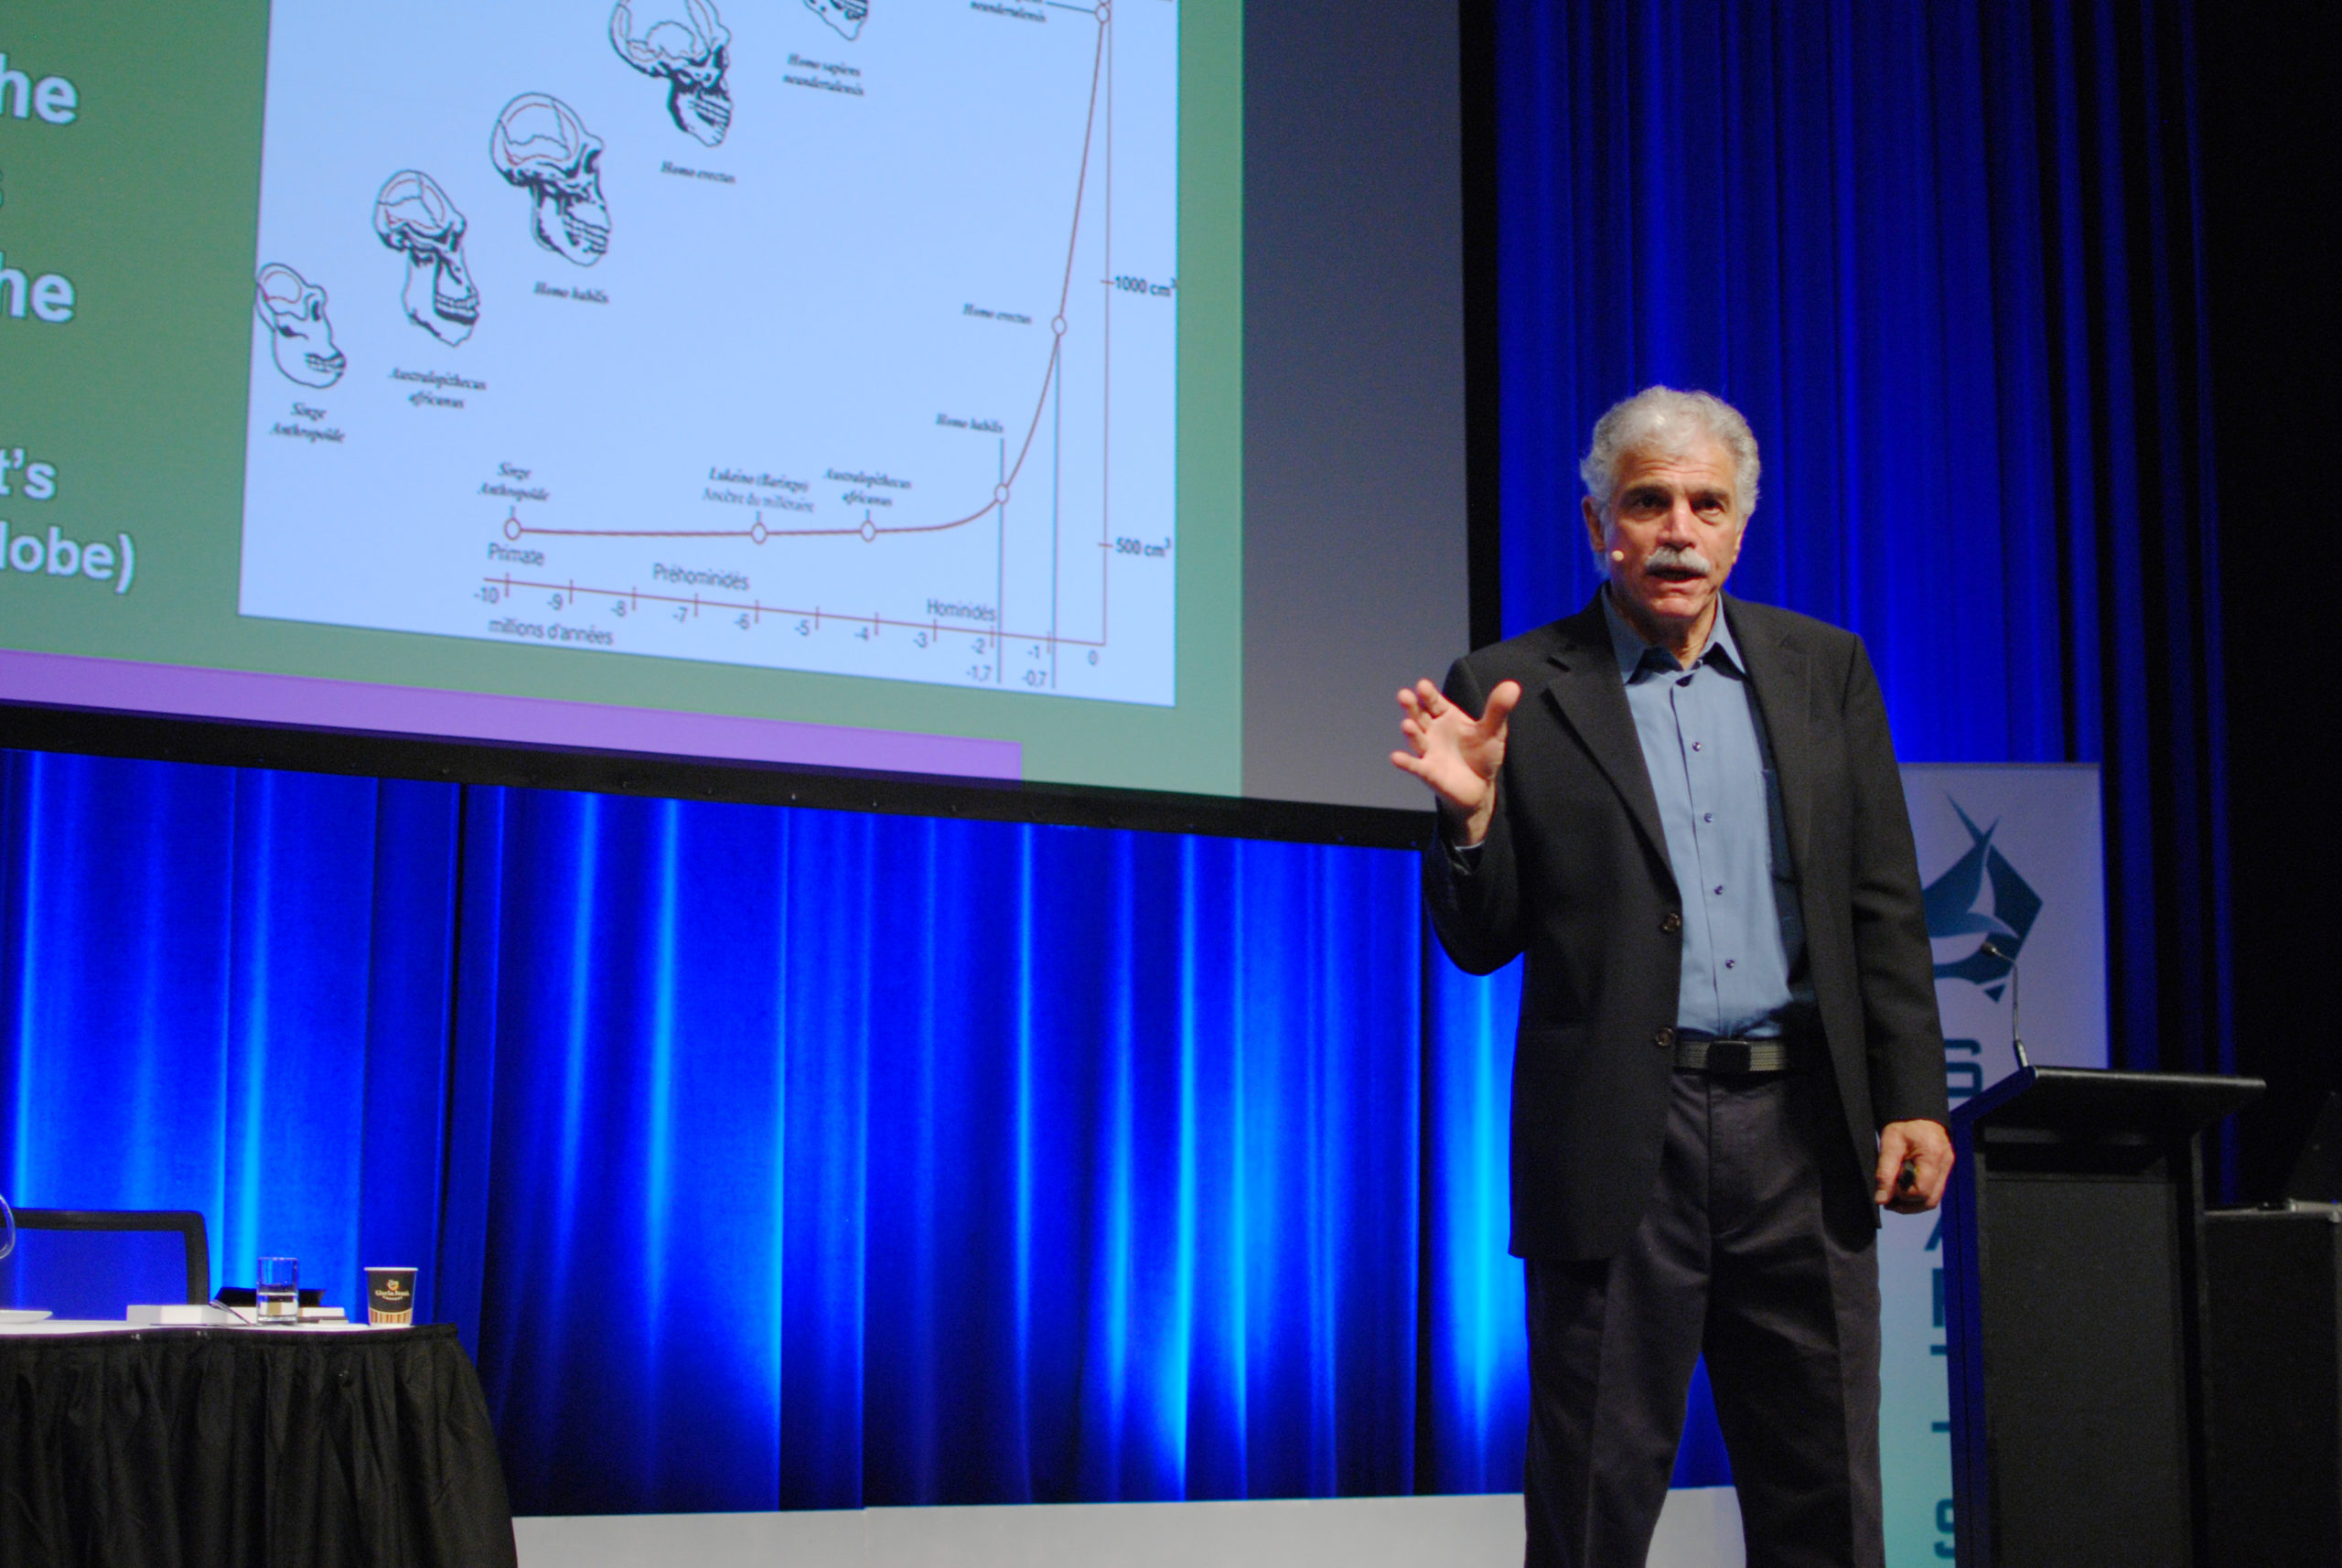 Dr John Arden Returns To Sydney To Present On Revolutionary Developments In Mental Healthcare